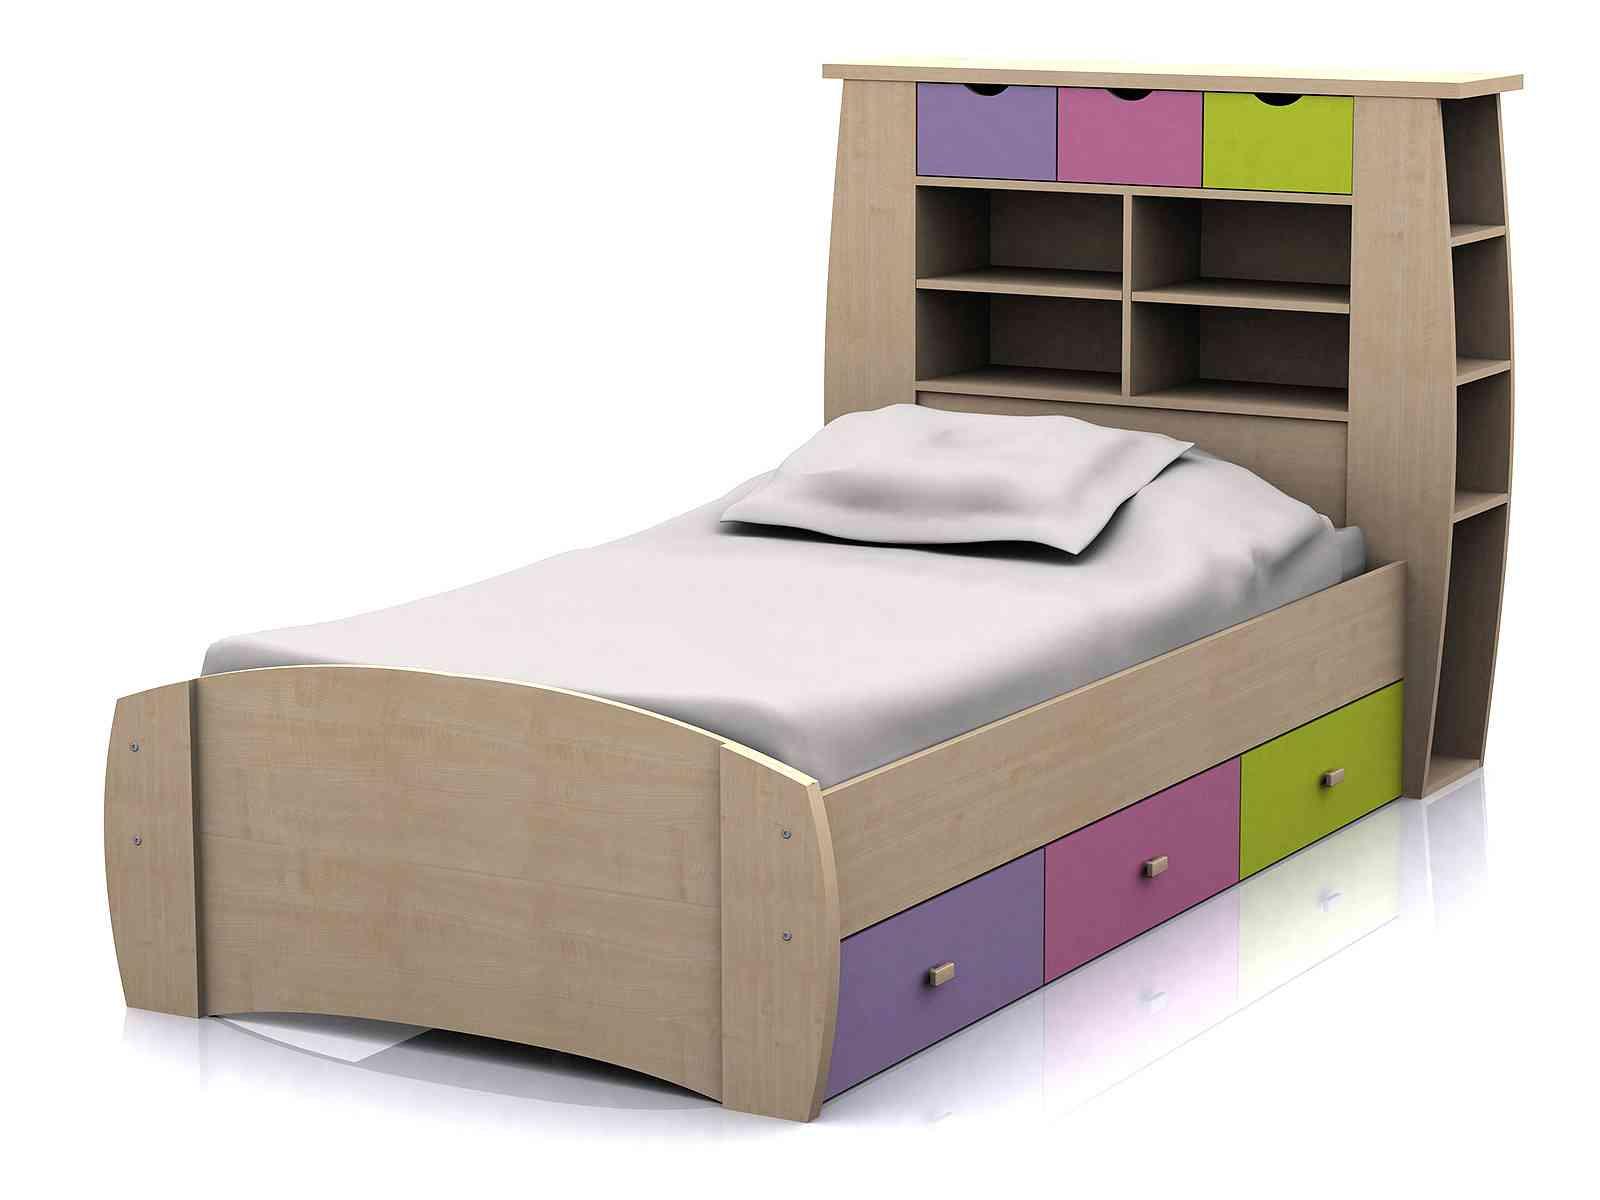 Gfw The Furniture Warehouse Sydney 3 Storage Bed